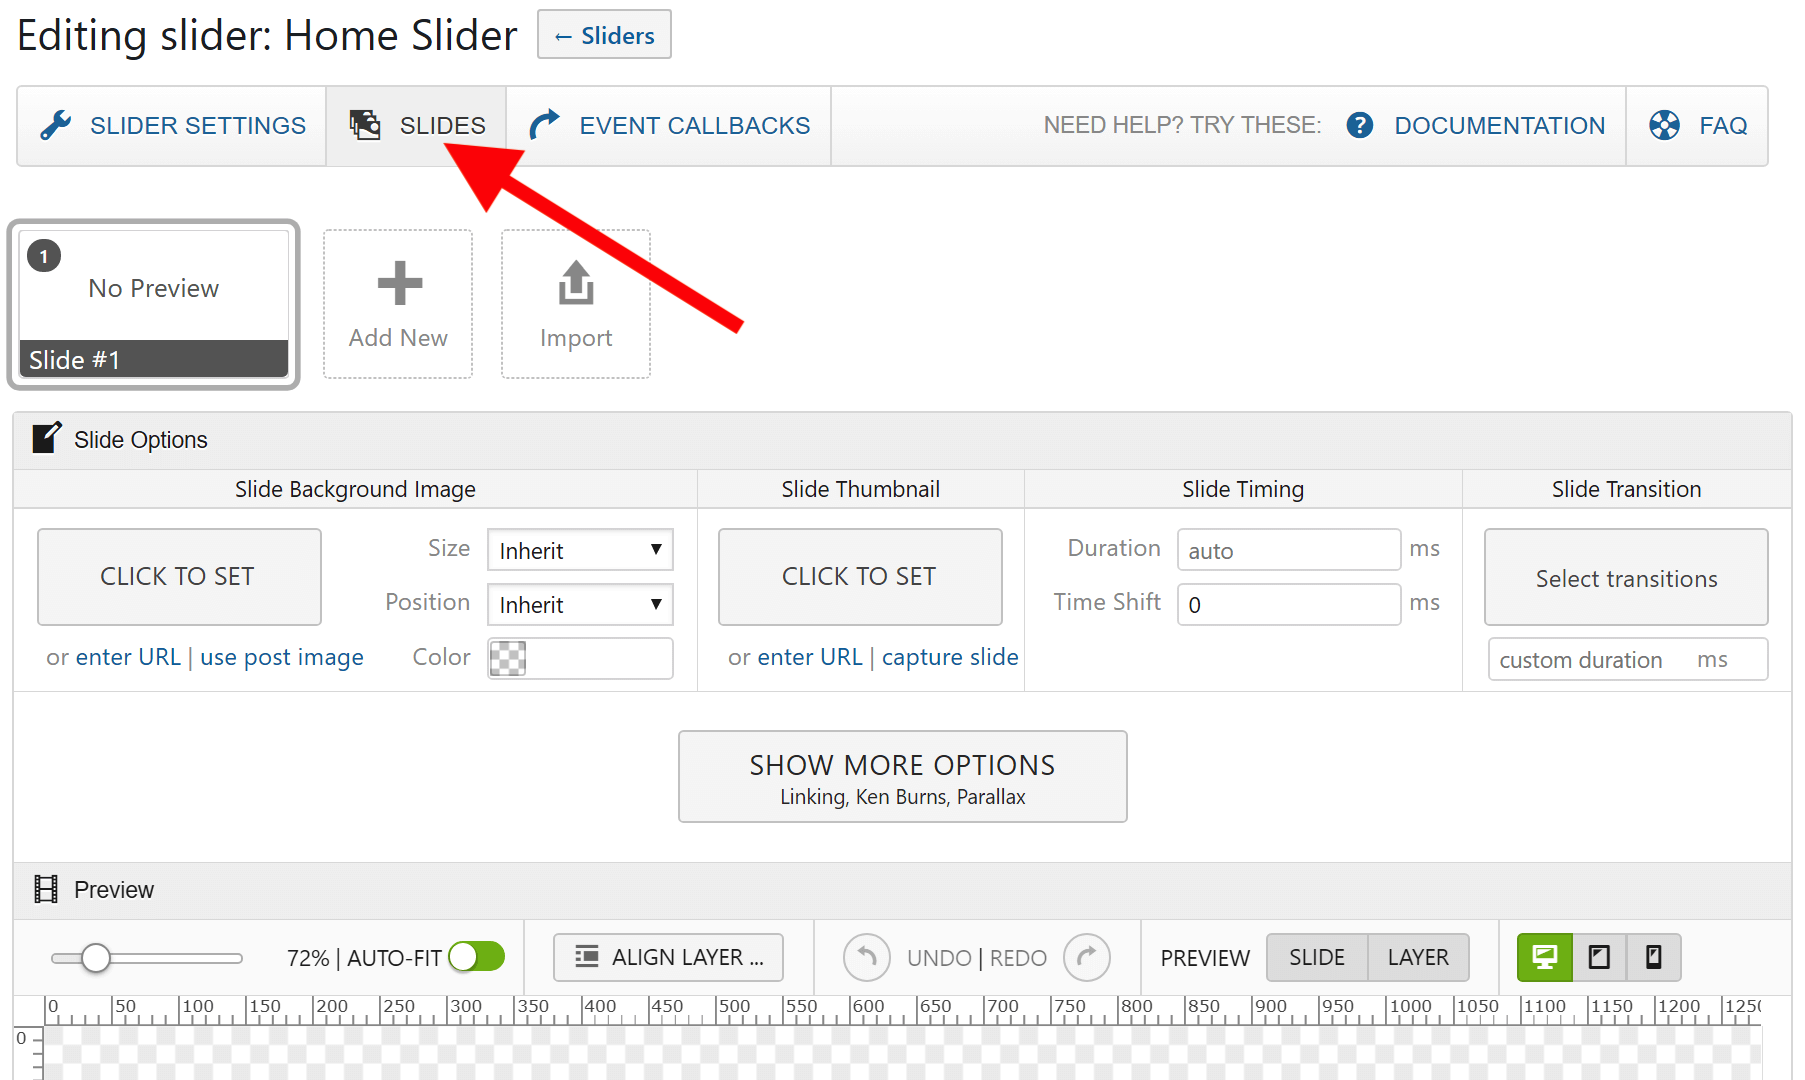 LayerSlider Editing Slider